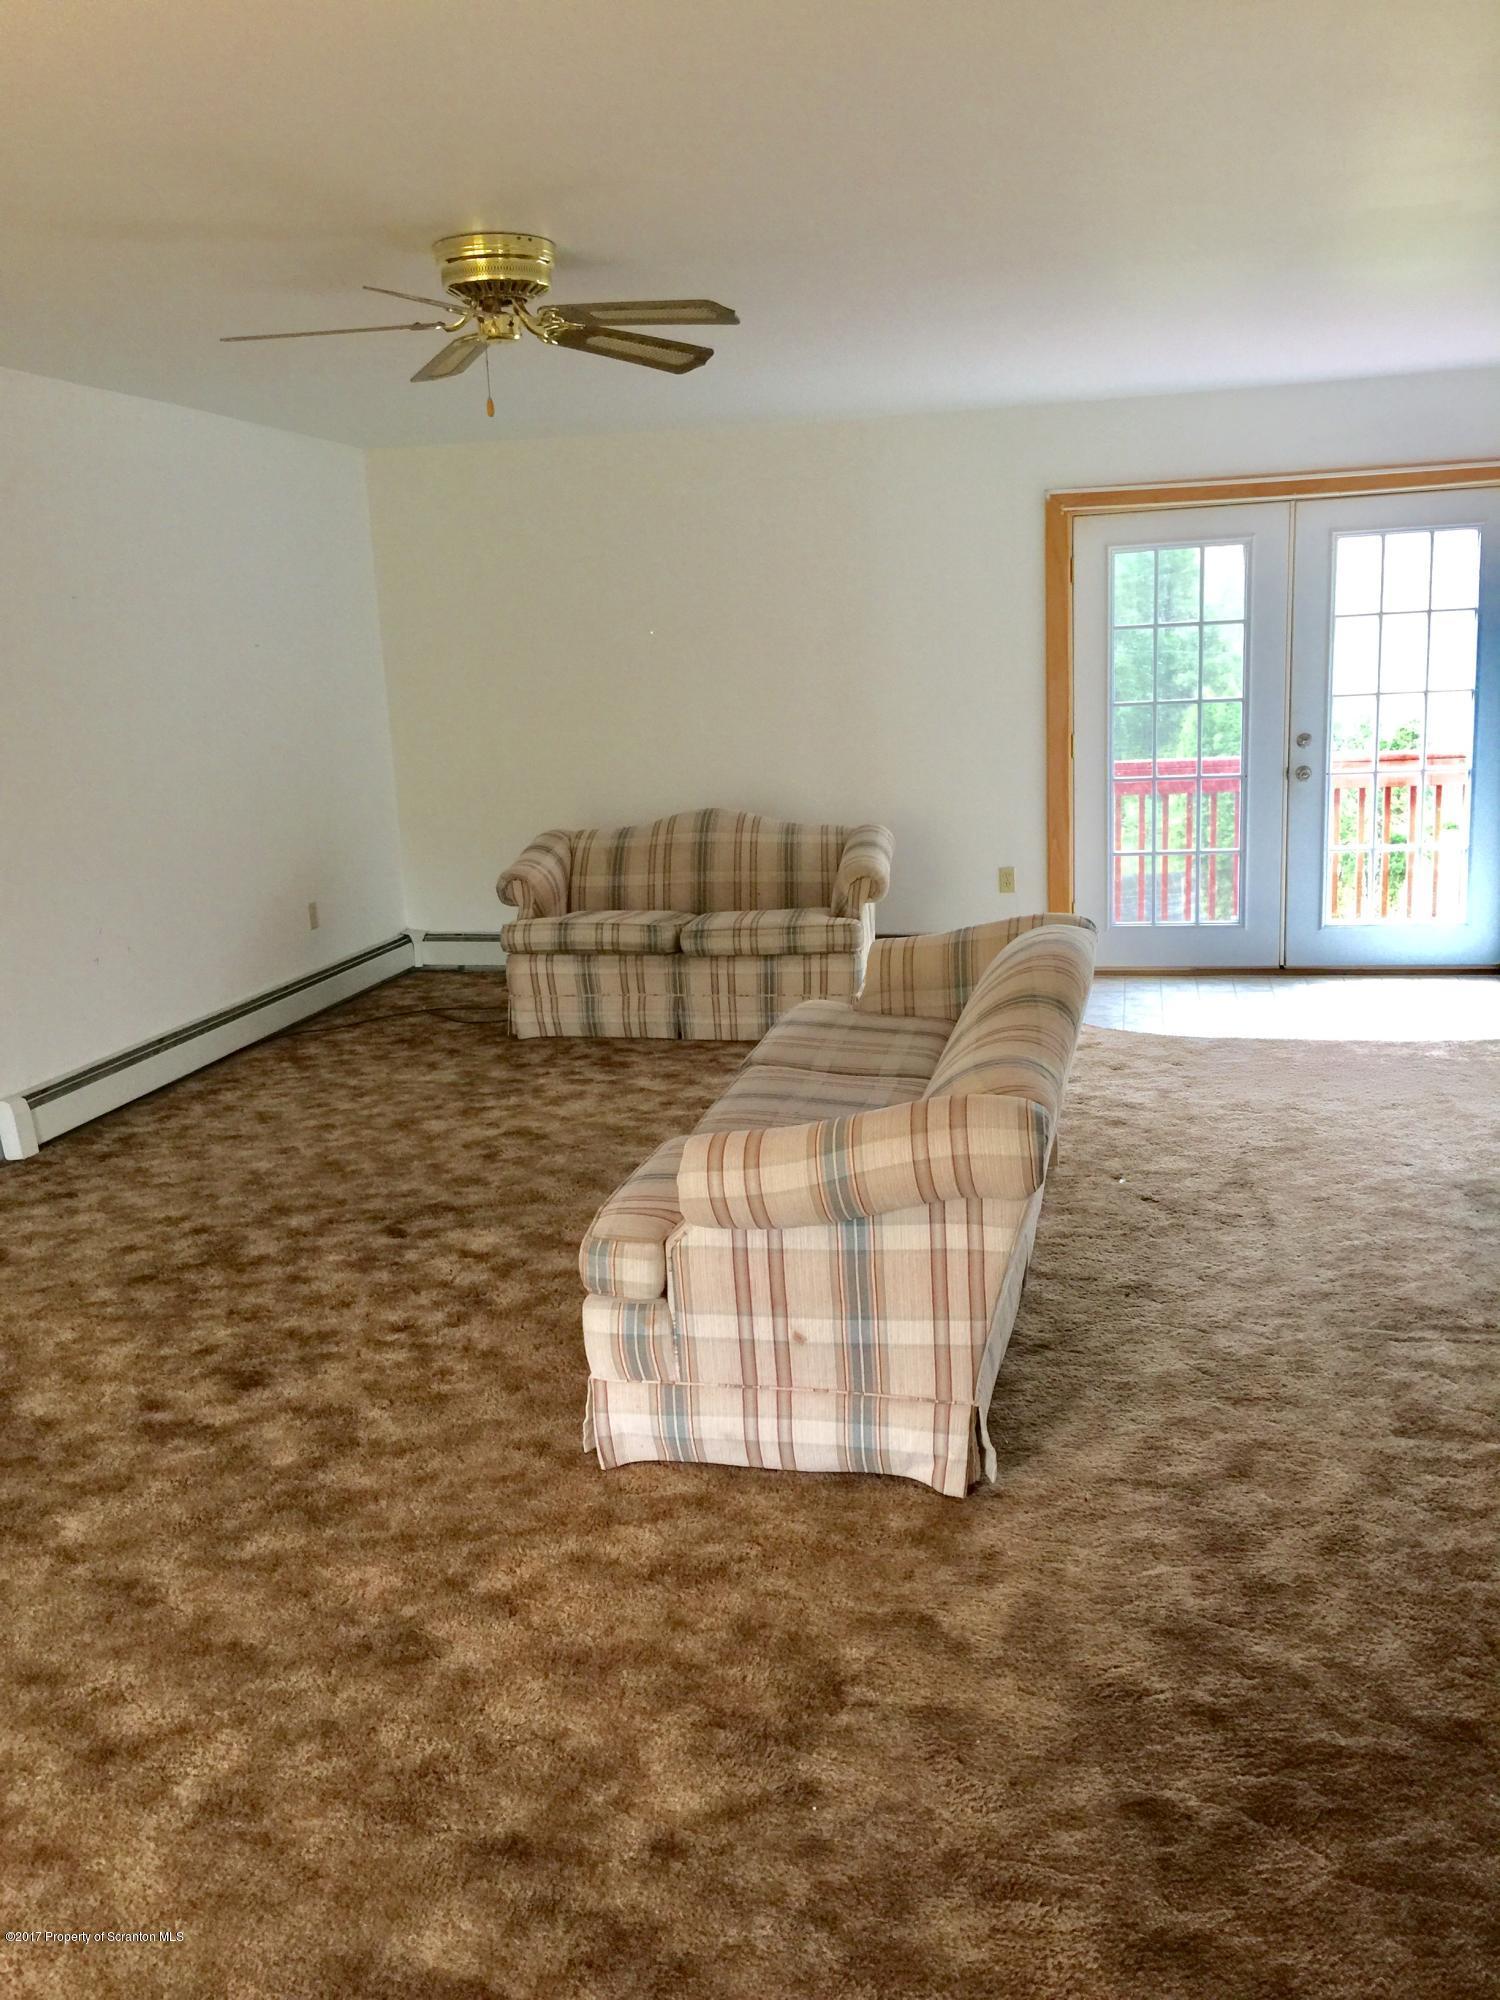 80 Worth Church Rd, Jermyn, Pennsylvania 18433, 1 Bedroom Bedrooms, 4 Rooms Rooms,1 BathroomBathrooms,Rental,For Lease,Worth Church,19-5208